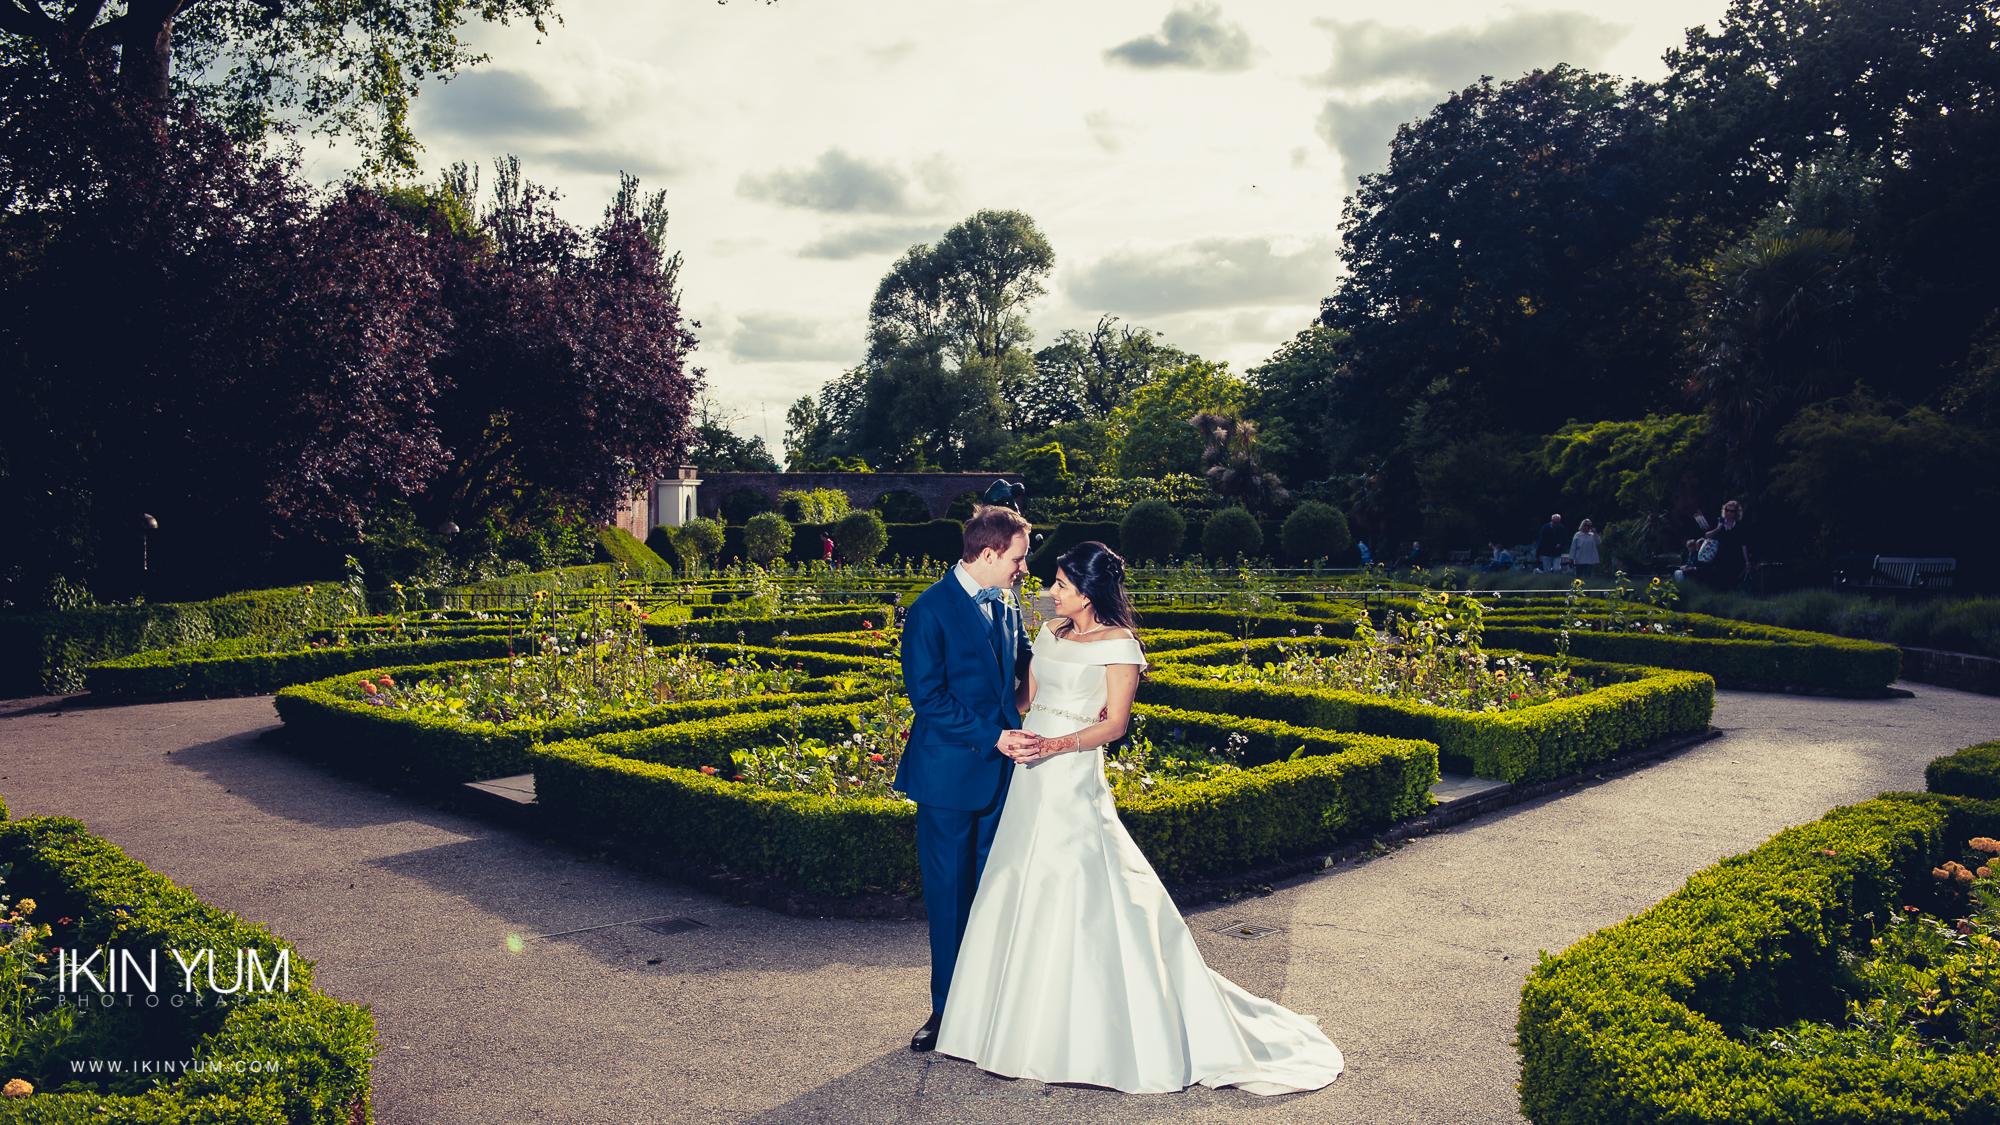 Holland Park Wedding - Ikin Yum Photography-0052.jpg